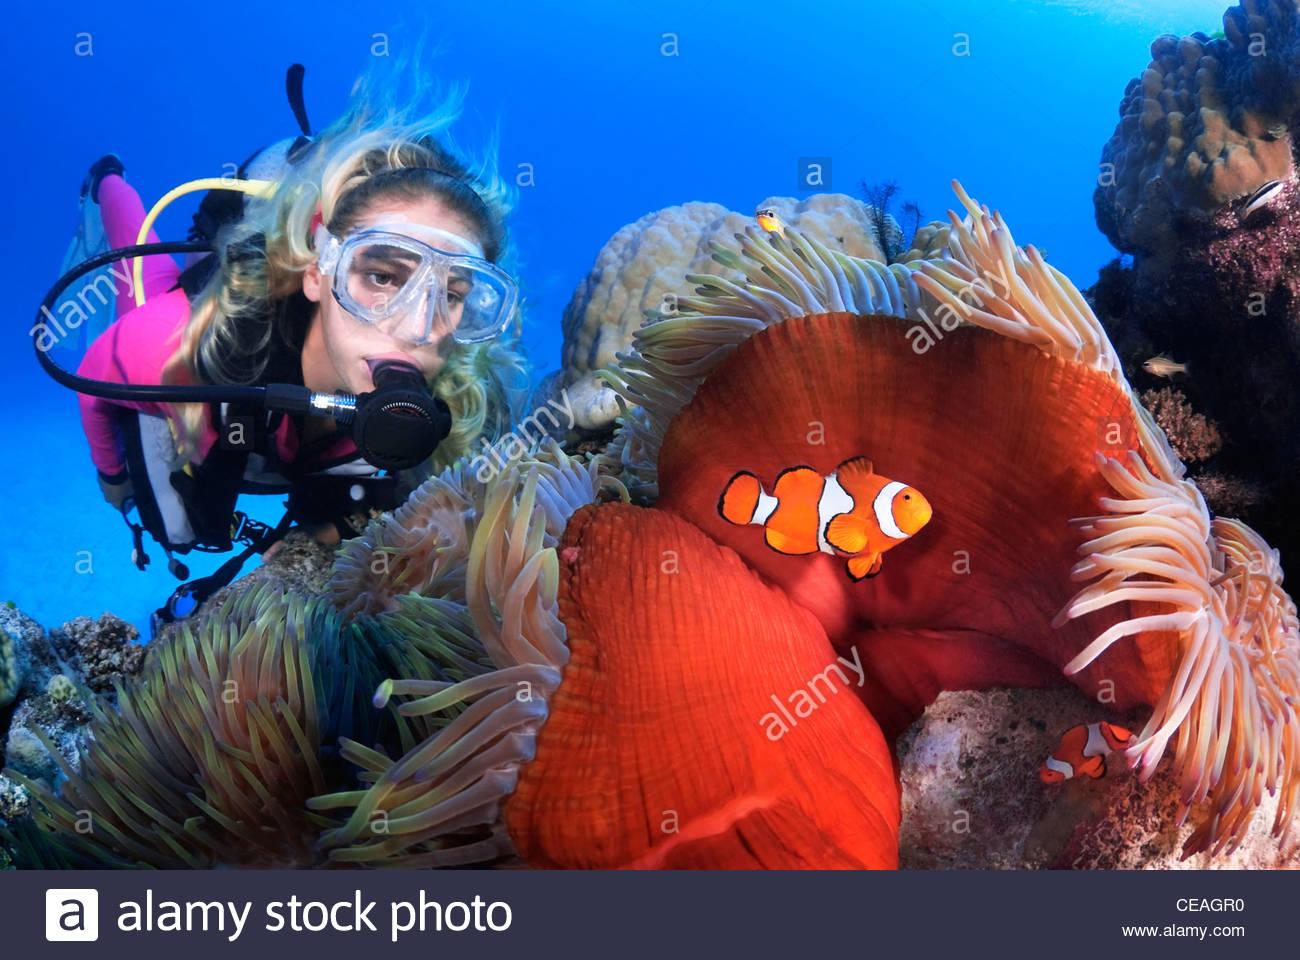 Ocellaris Clownfish (Amphiprion ocellaris), Great Barrier Reef - Stock Image